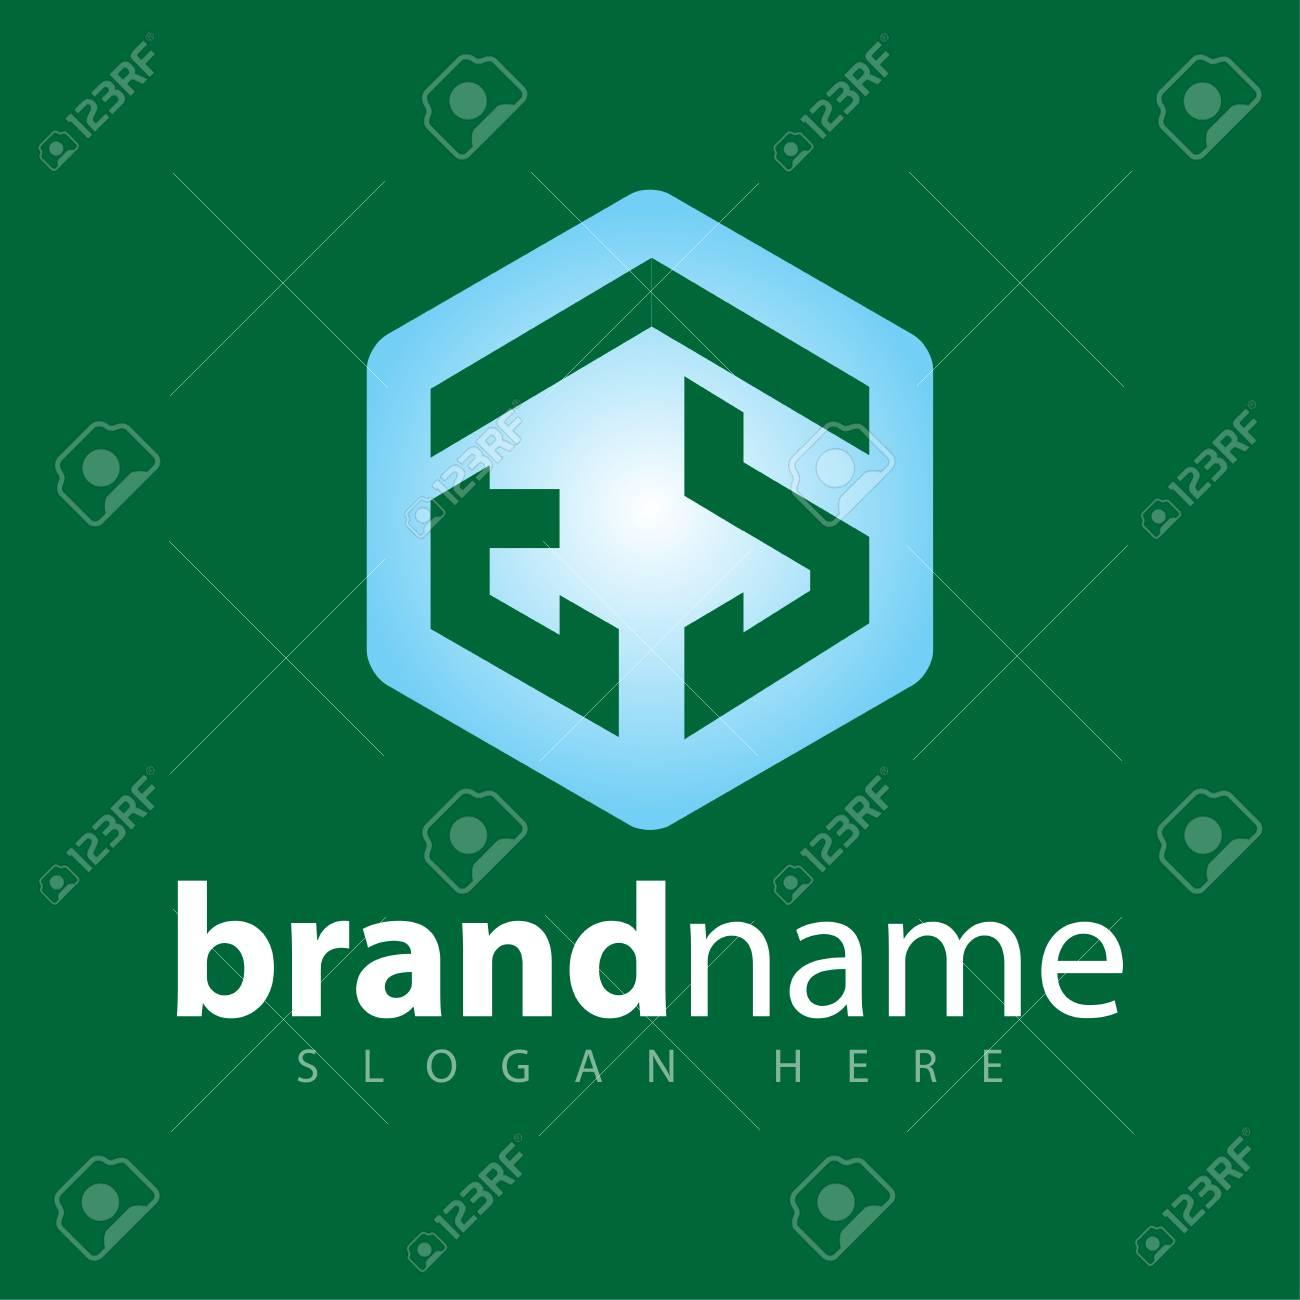 ES Initial letter hexagonal logo vector - 106627805